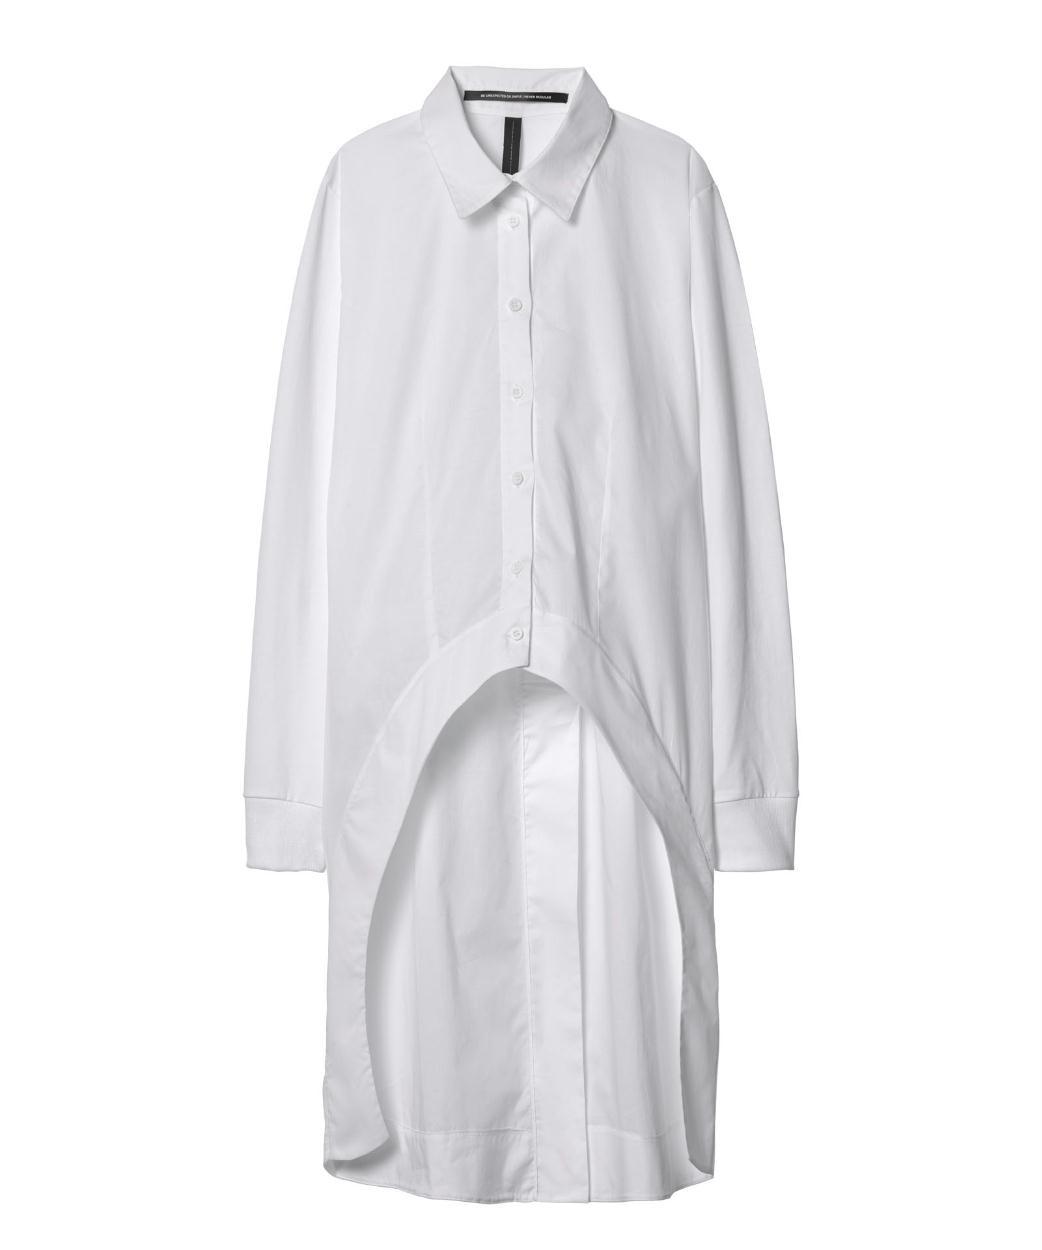 10Days White Smoking Shirt 20.400.9103/8